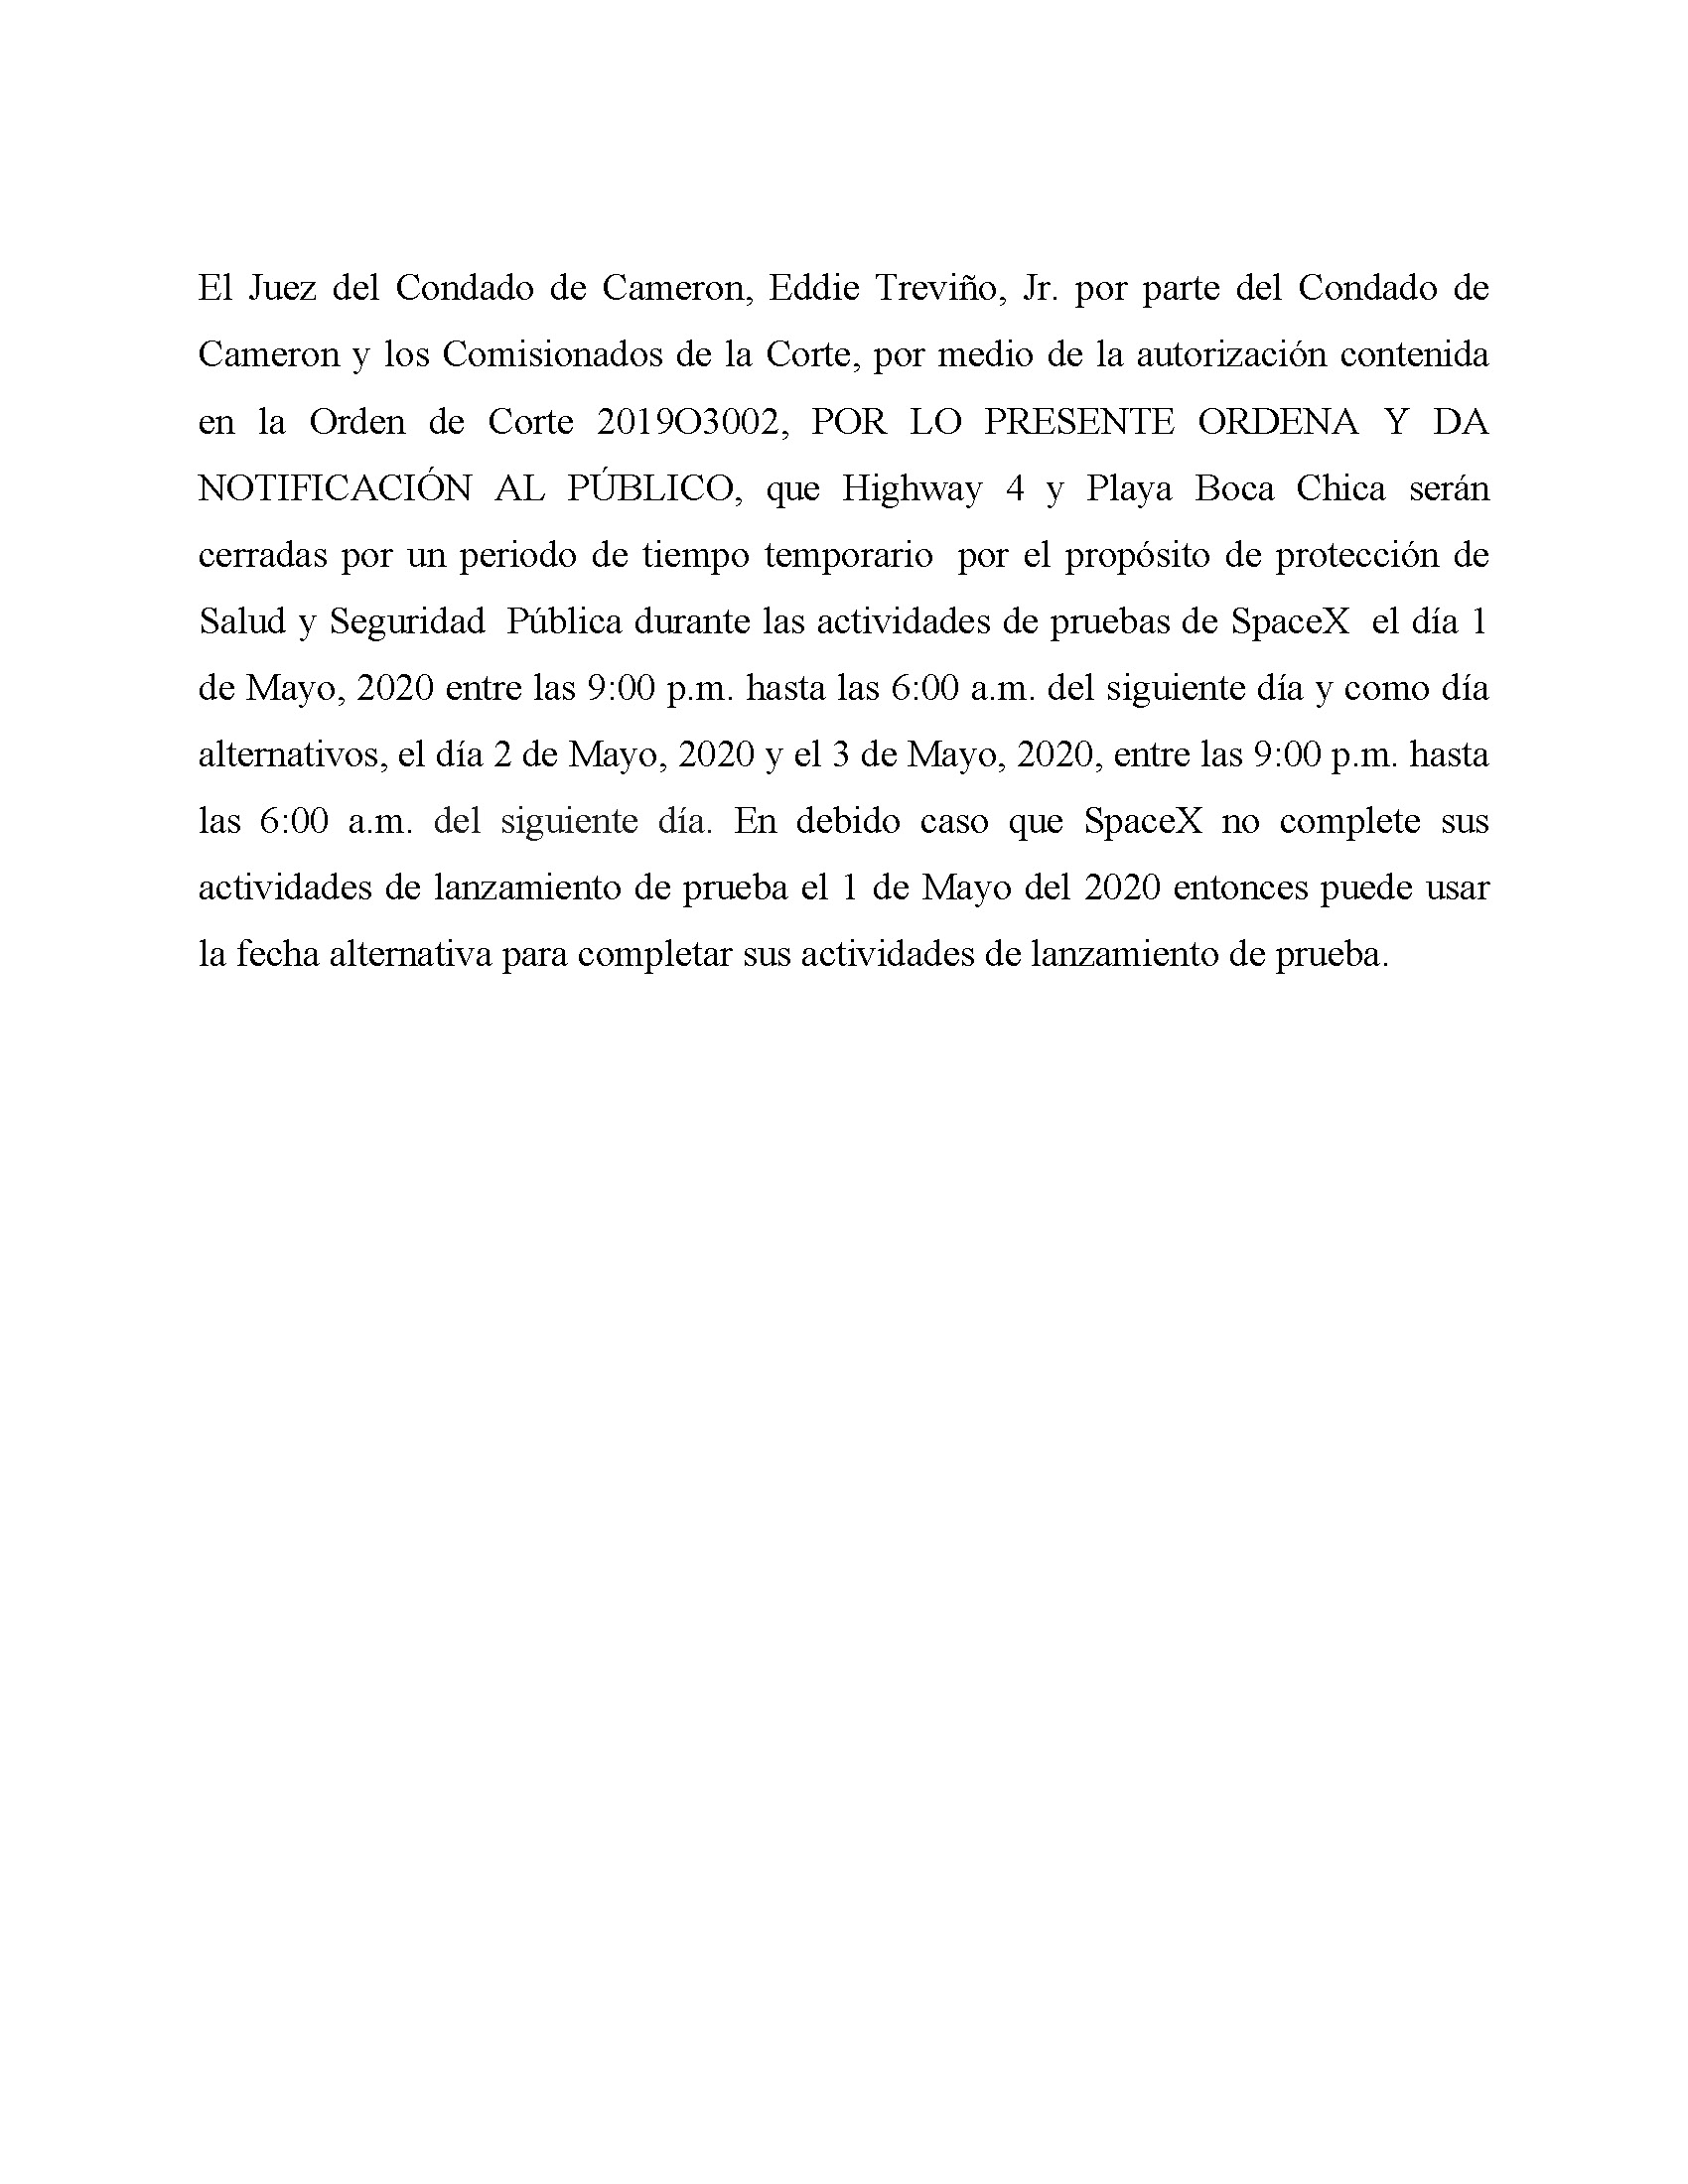 ORDER.CLOSURE OF HIGHWAY 4 Y LA PLAYA BOCA CHICA.SPANISH.05.01.20